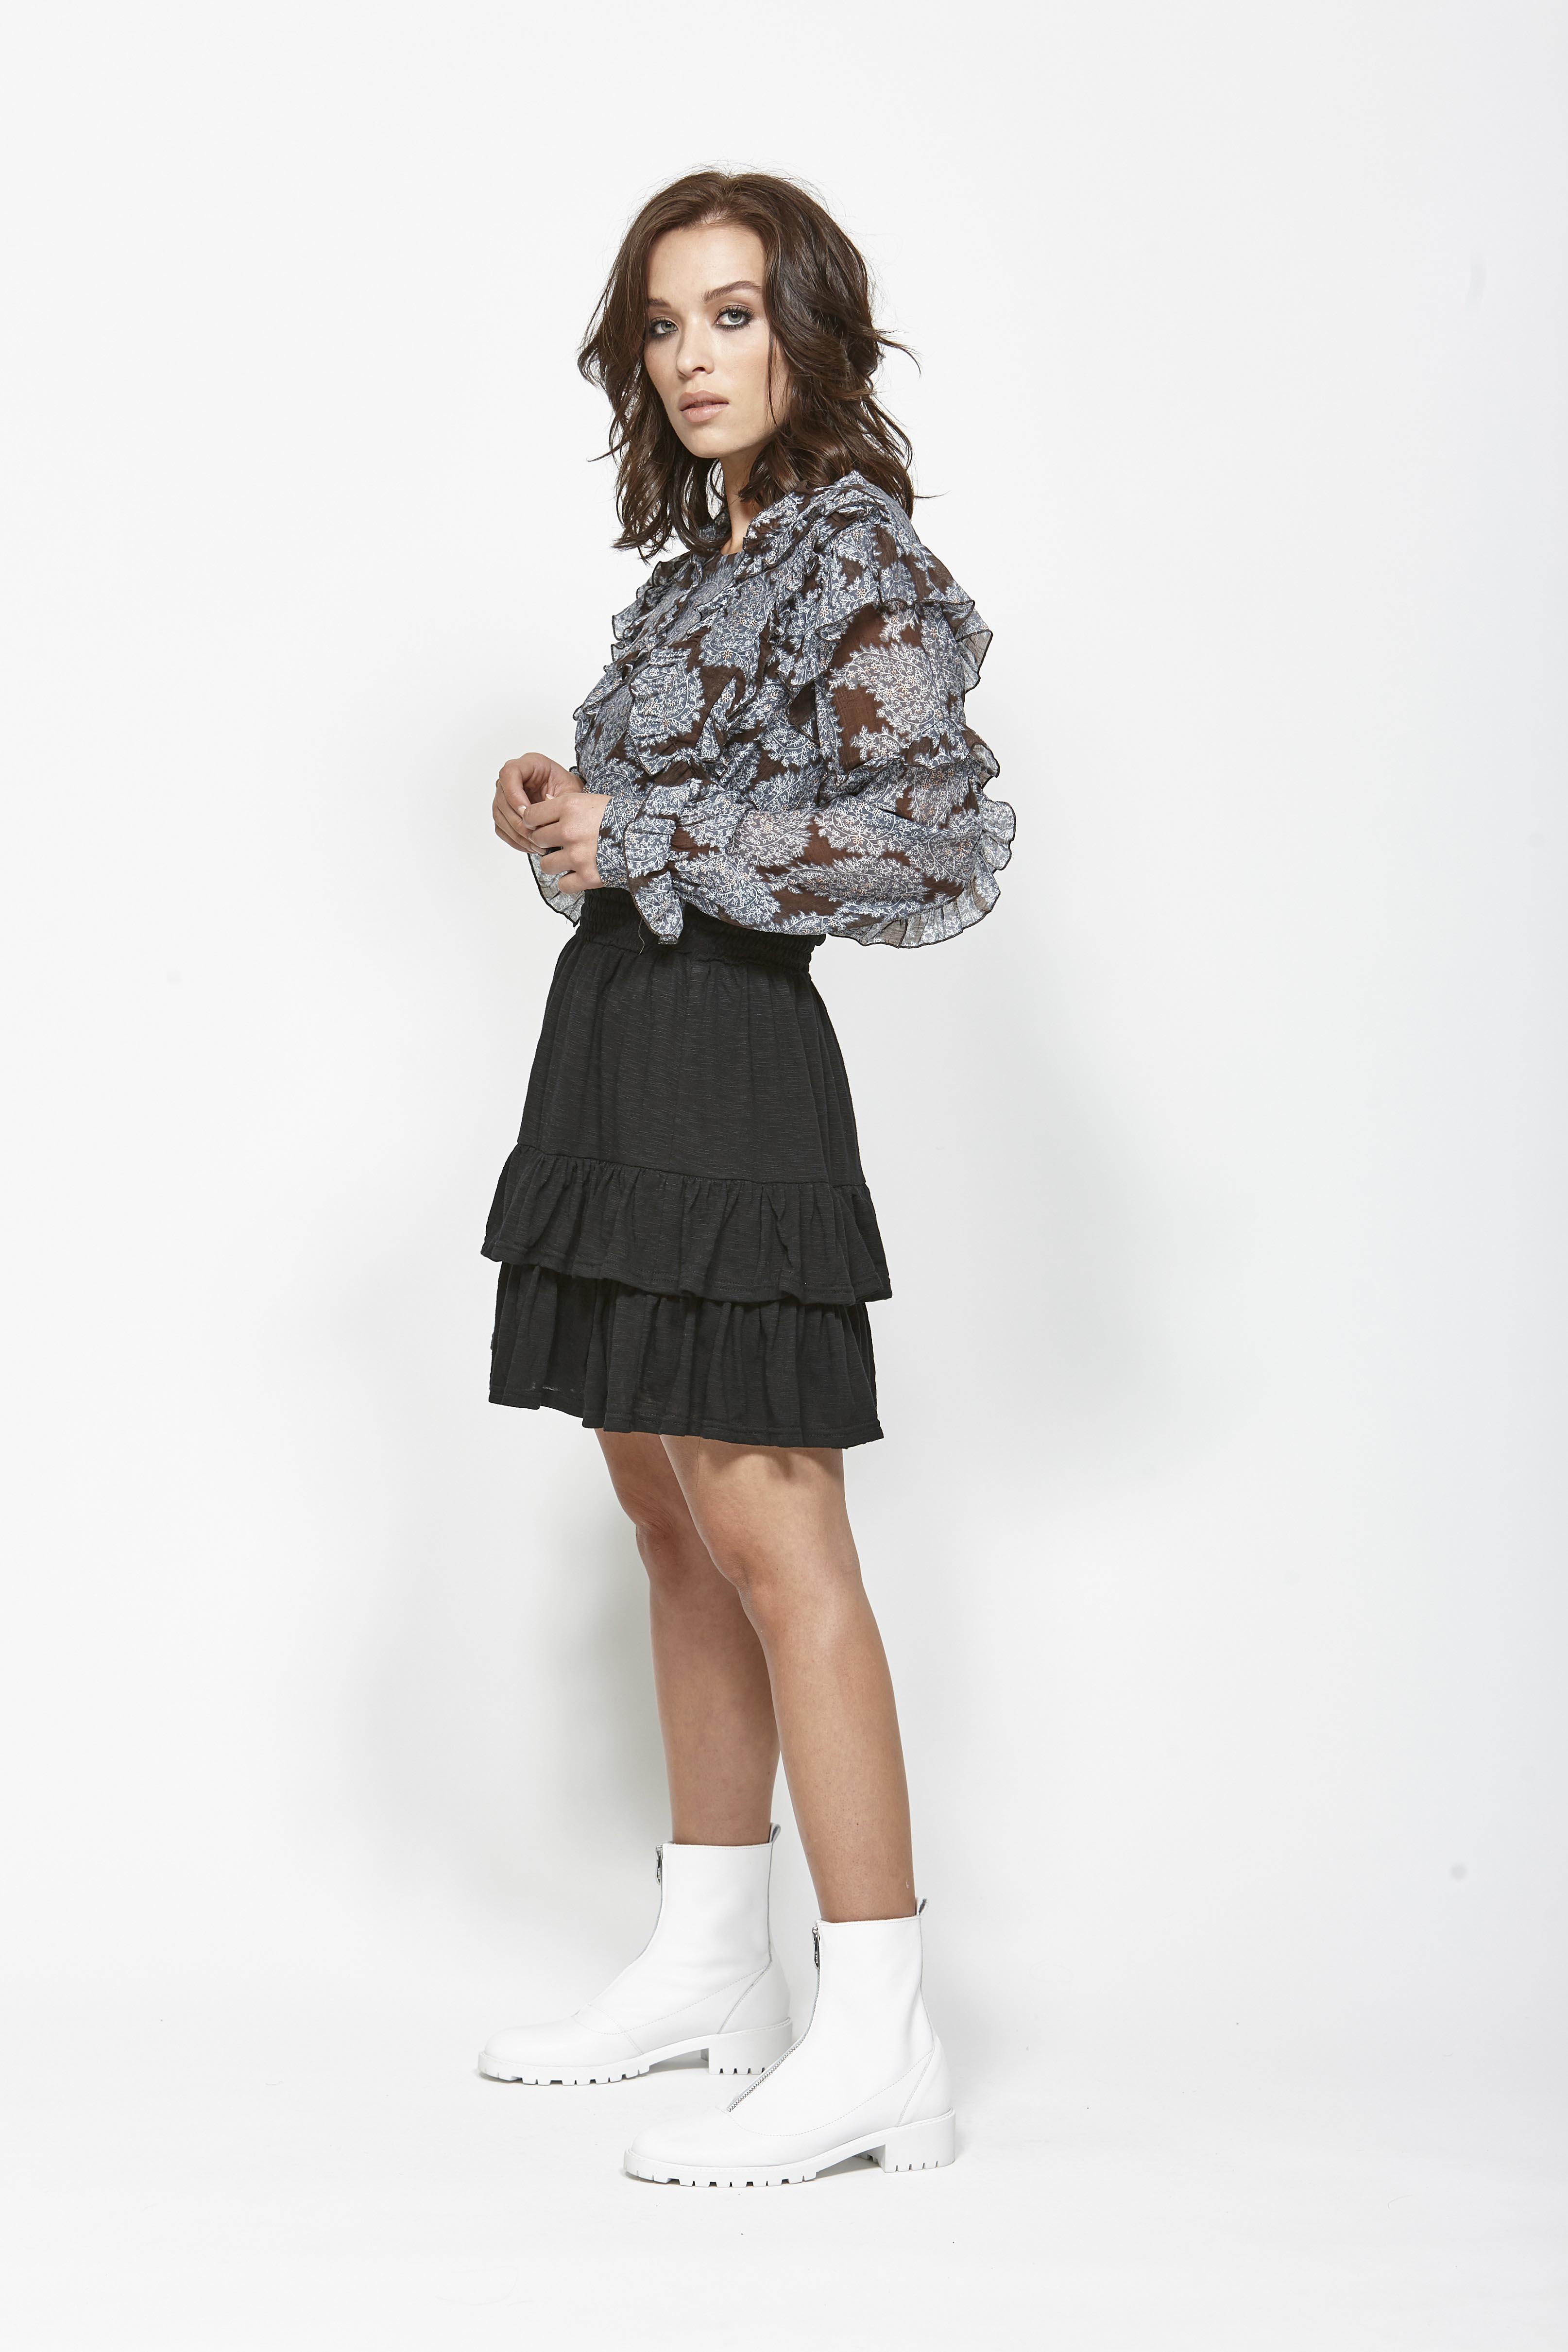 LEO+BE LB1368 Space Shirt, RRP$159.00 & LEO+BE LB1357 Sub Skirt, RRP$135.00 (1)